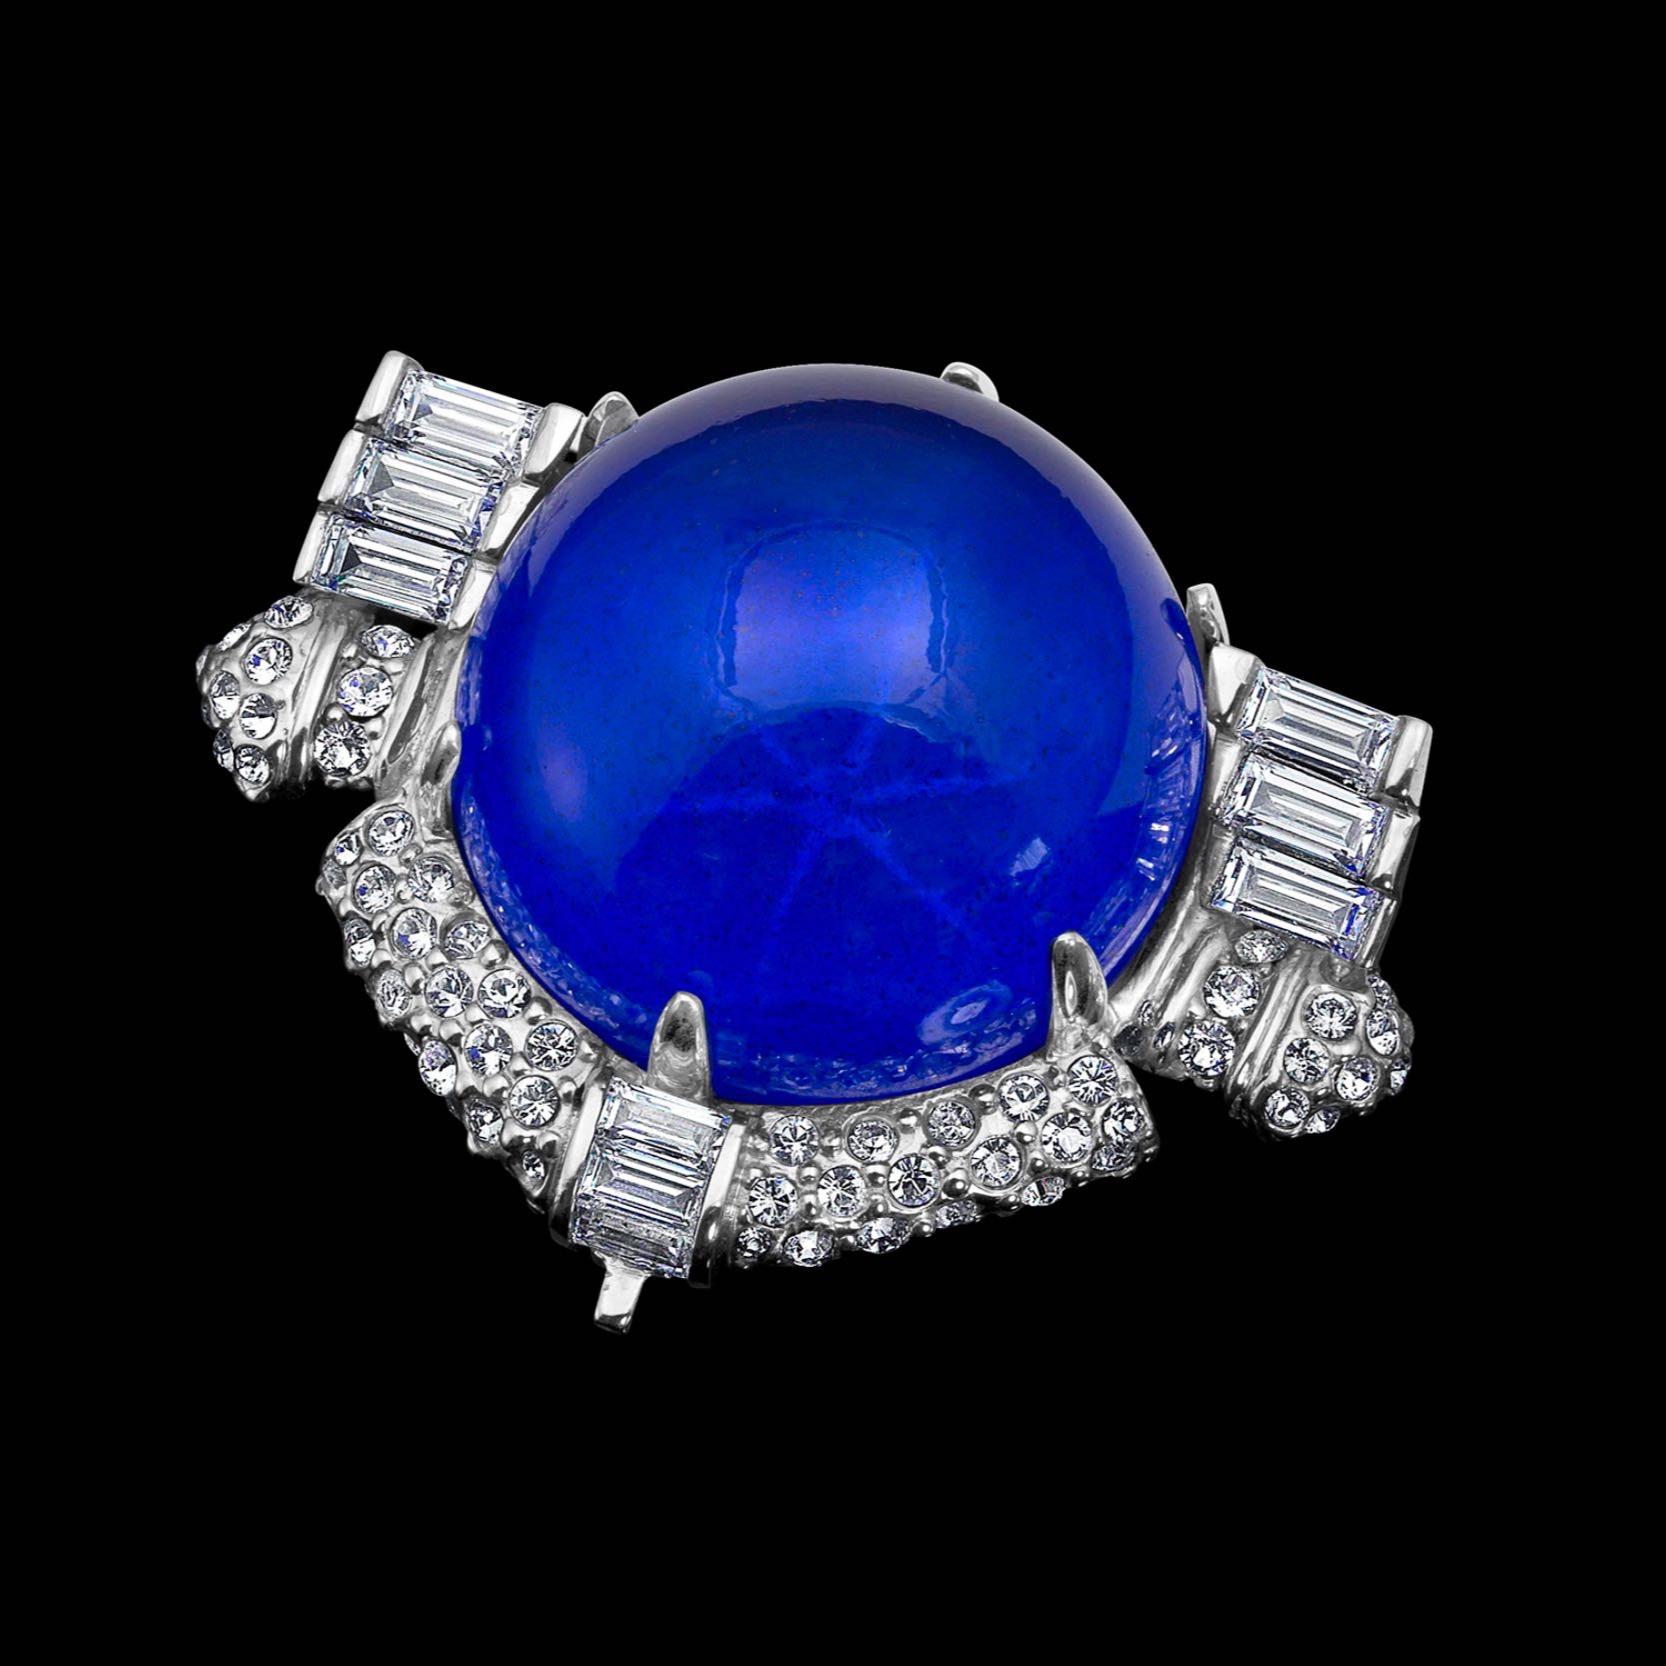 Star sapphire brooch replica